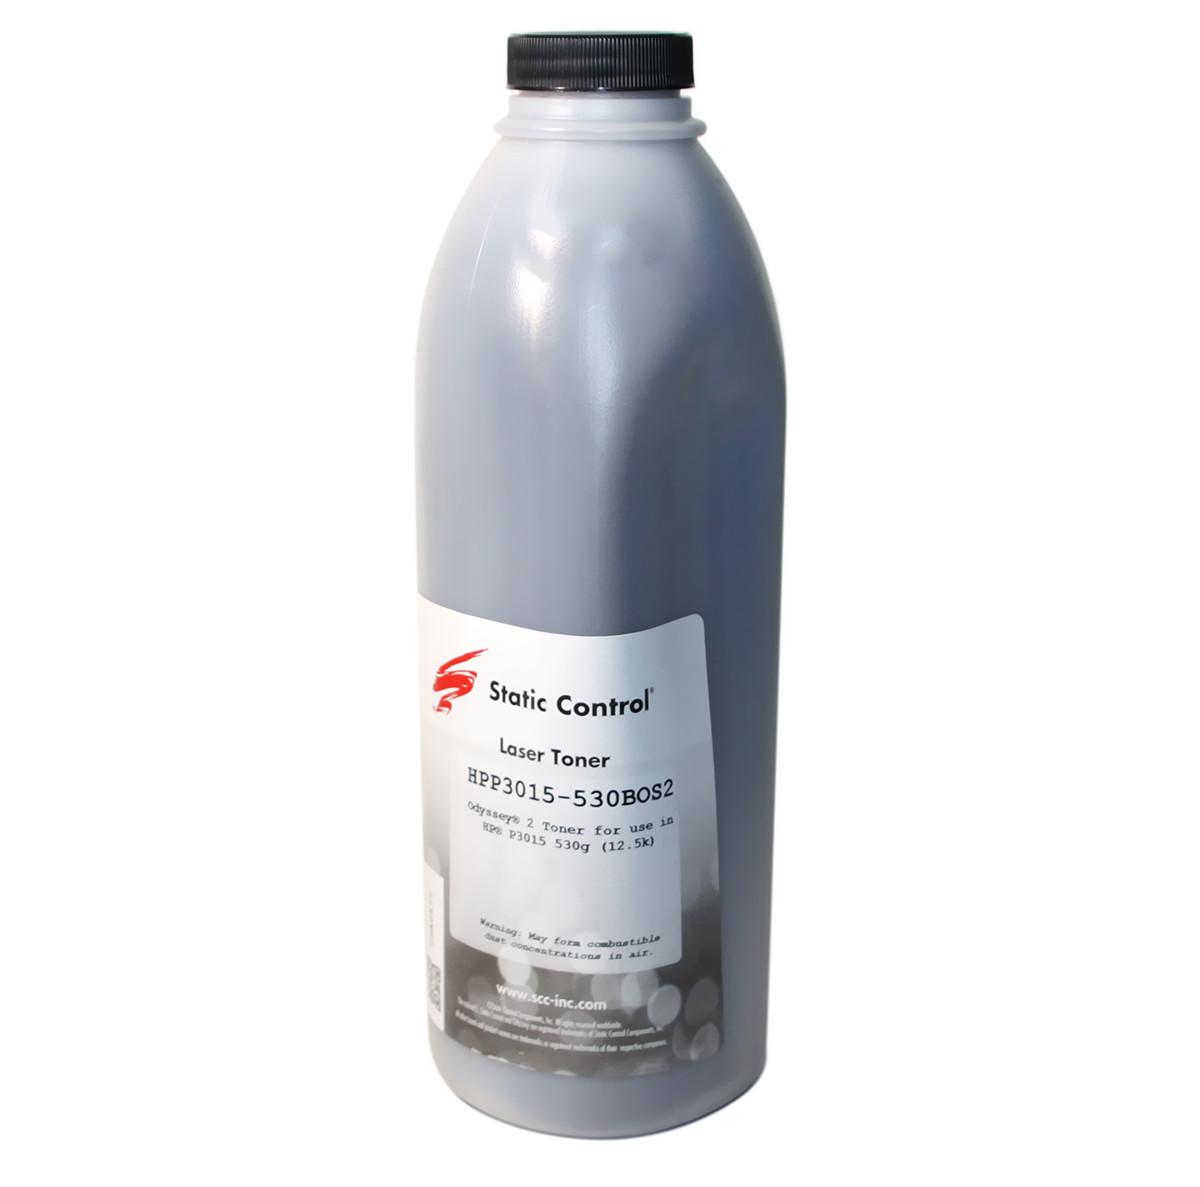 Тонер HP LJ P3015, 530 г, Static Control (HPP3015-530BOS2)